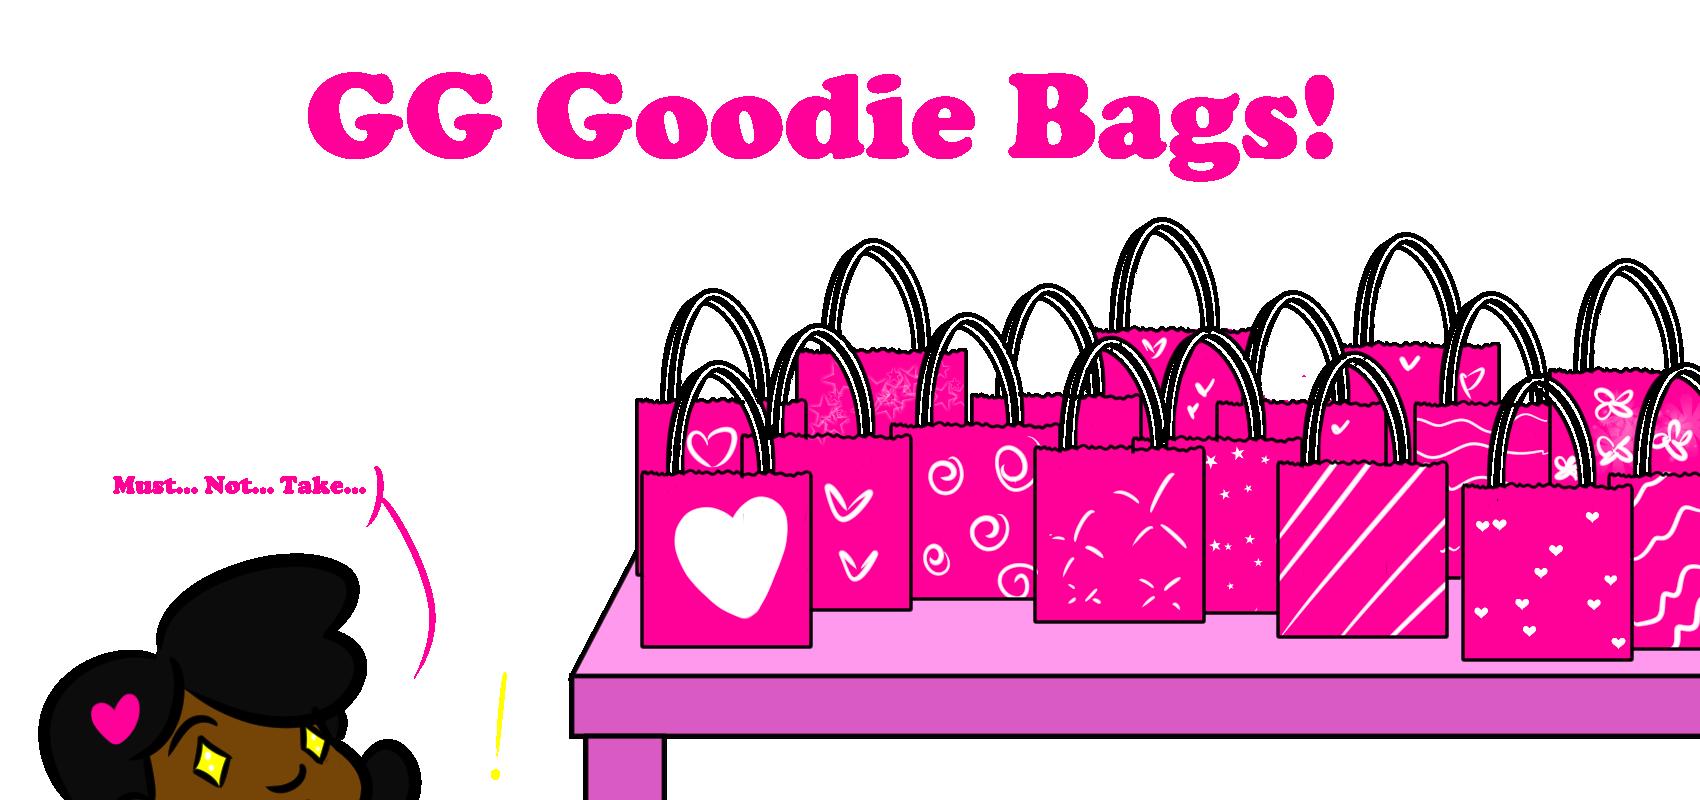 Ask Sam GG Goodie bags.png